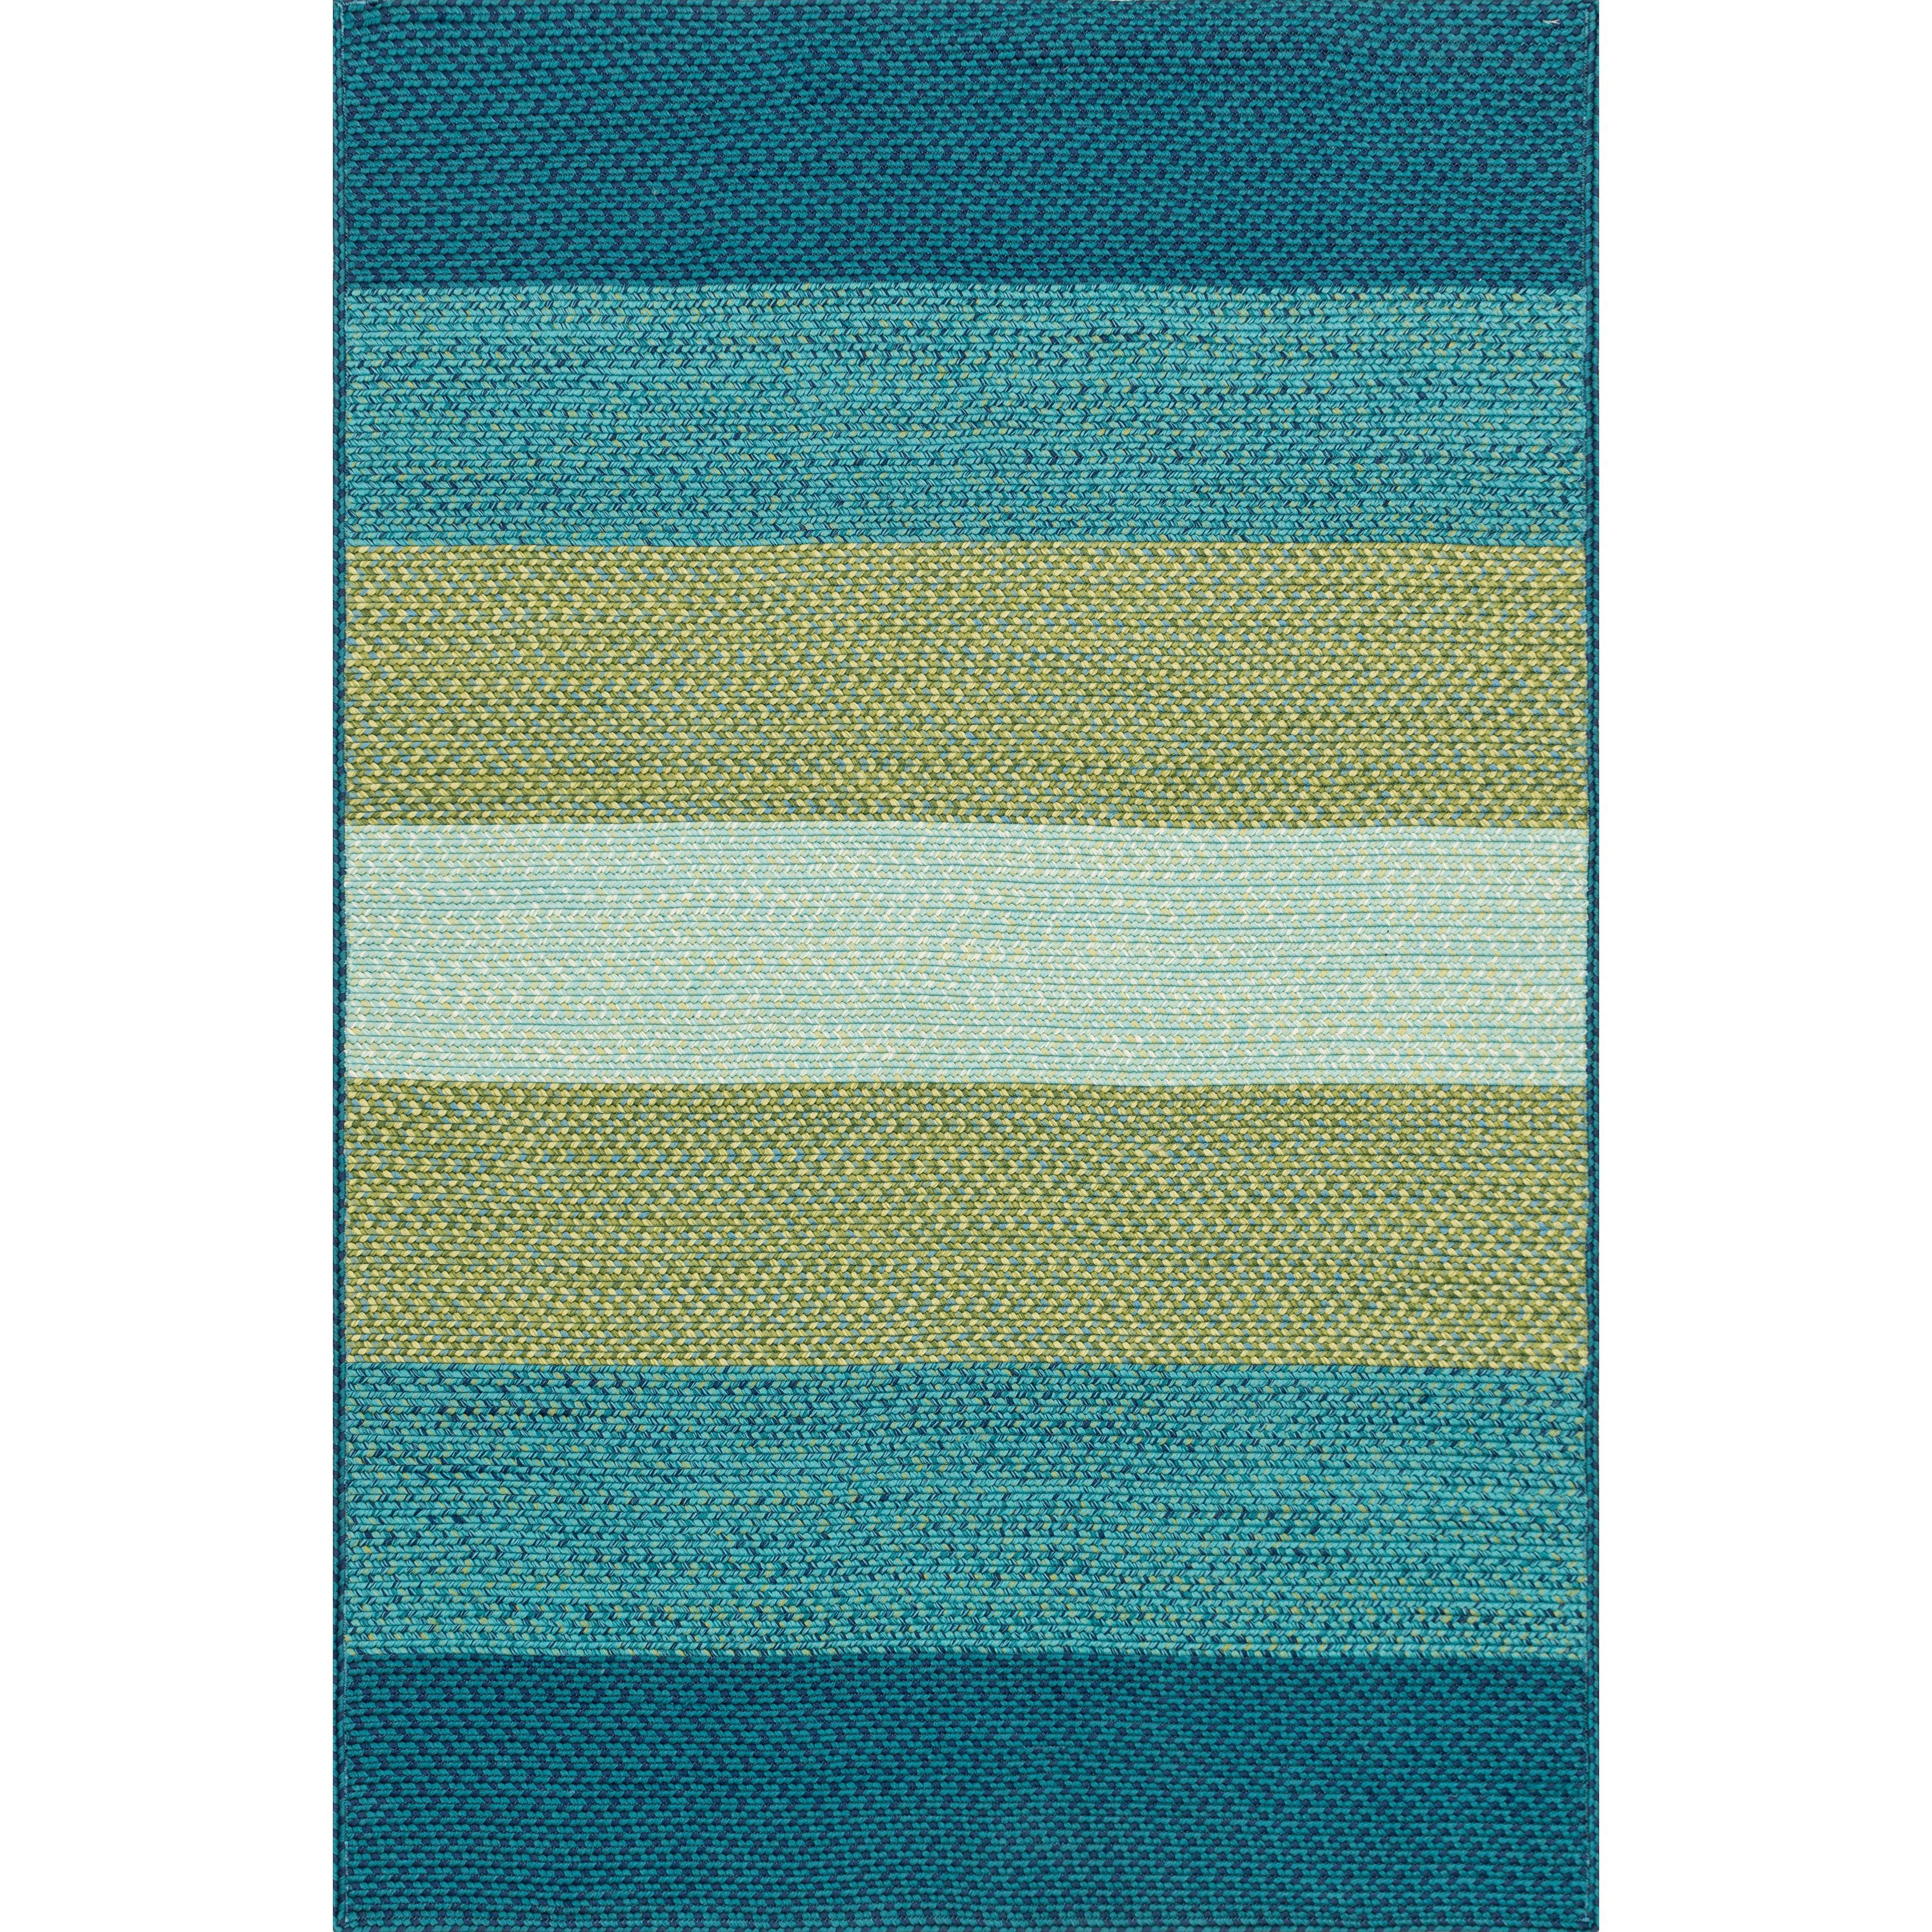 Alexander Home Indoor/ Outdoor Braided Blue/ Green Rug (2'3 x 3'9) (Blue/ Green (2'3 x 3'9)) (Plastic, Stripe)